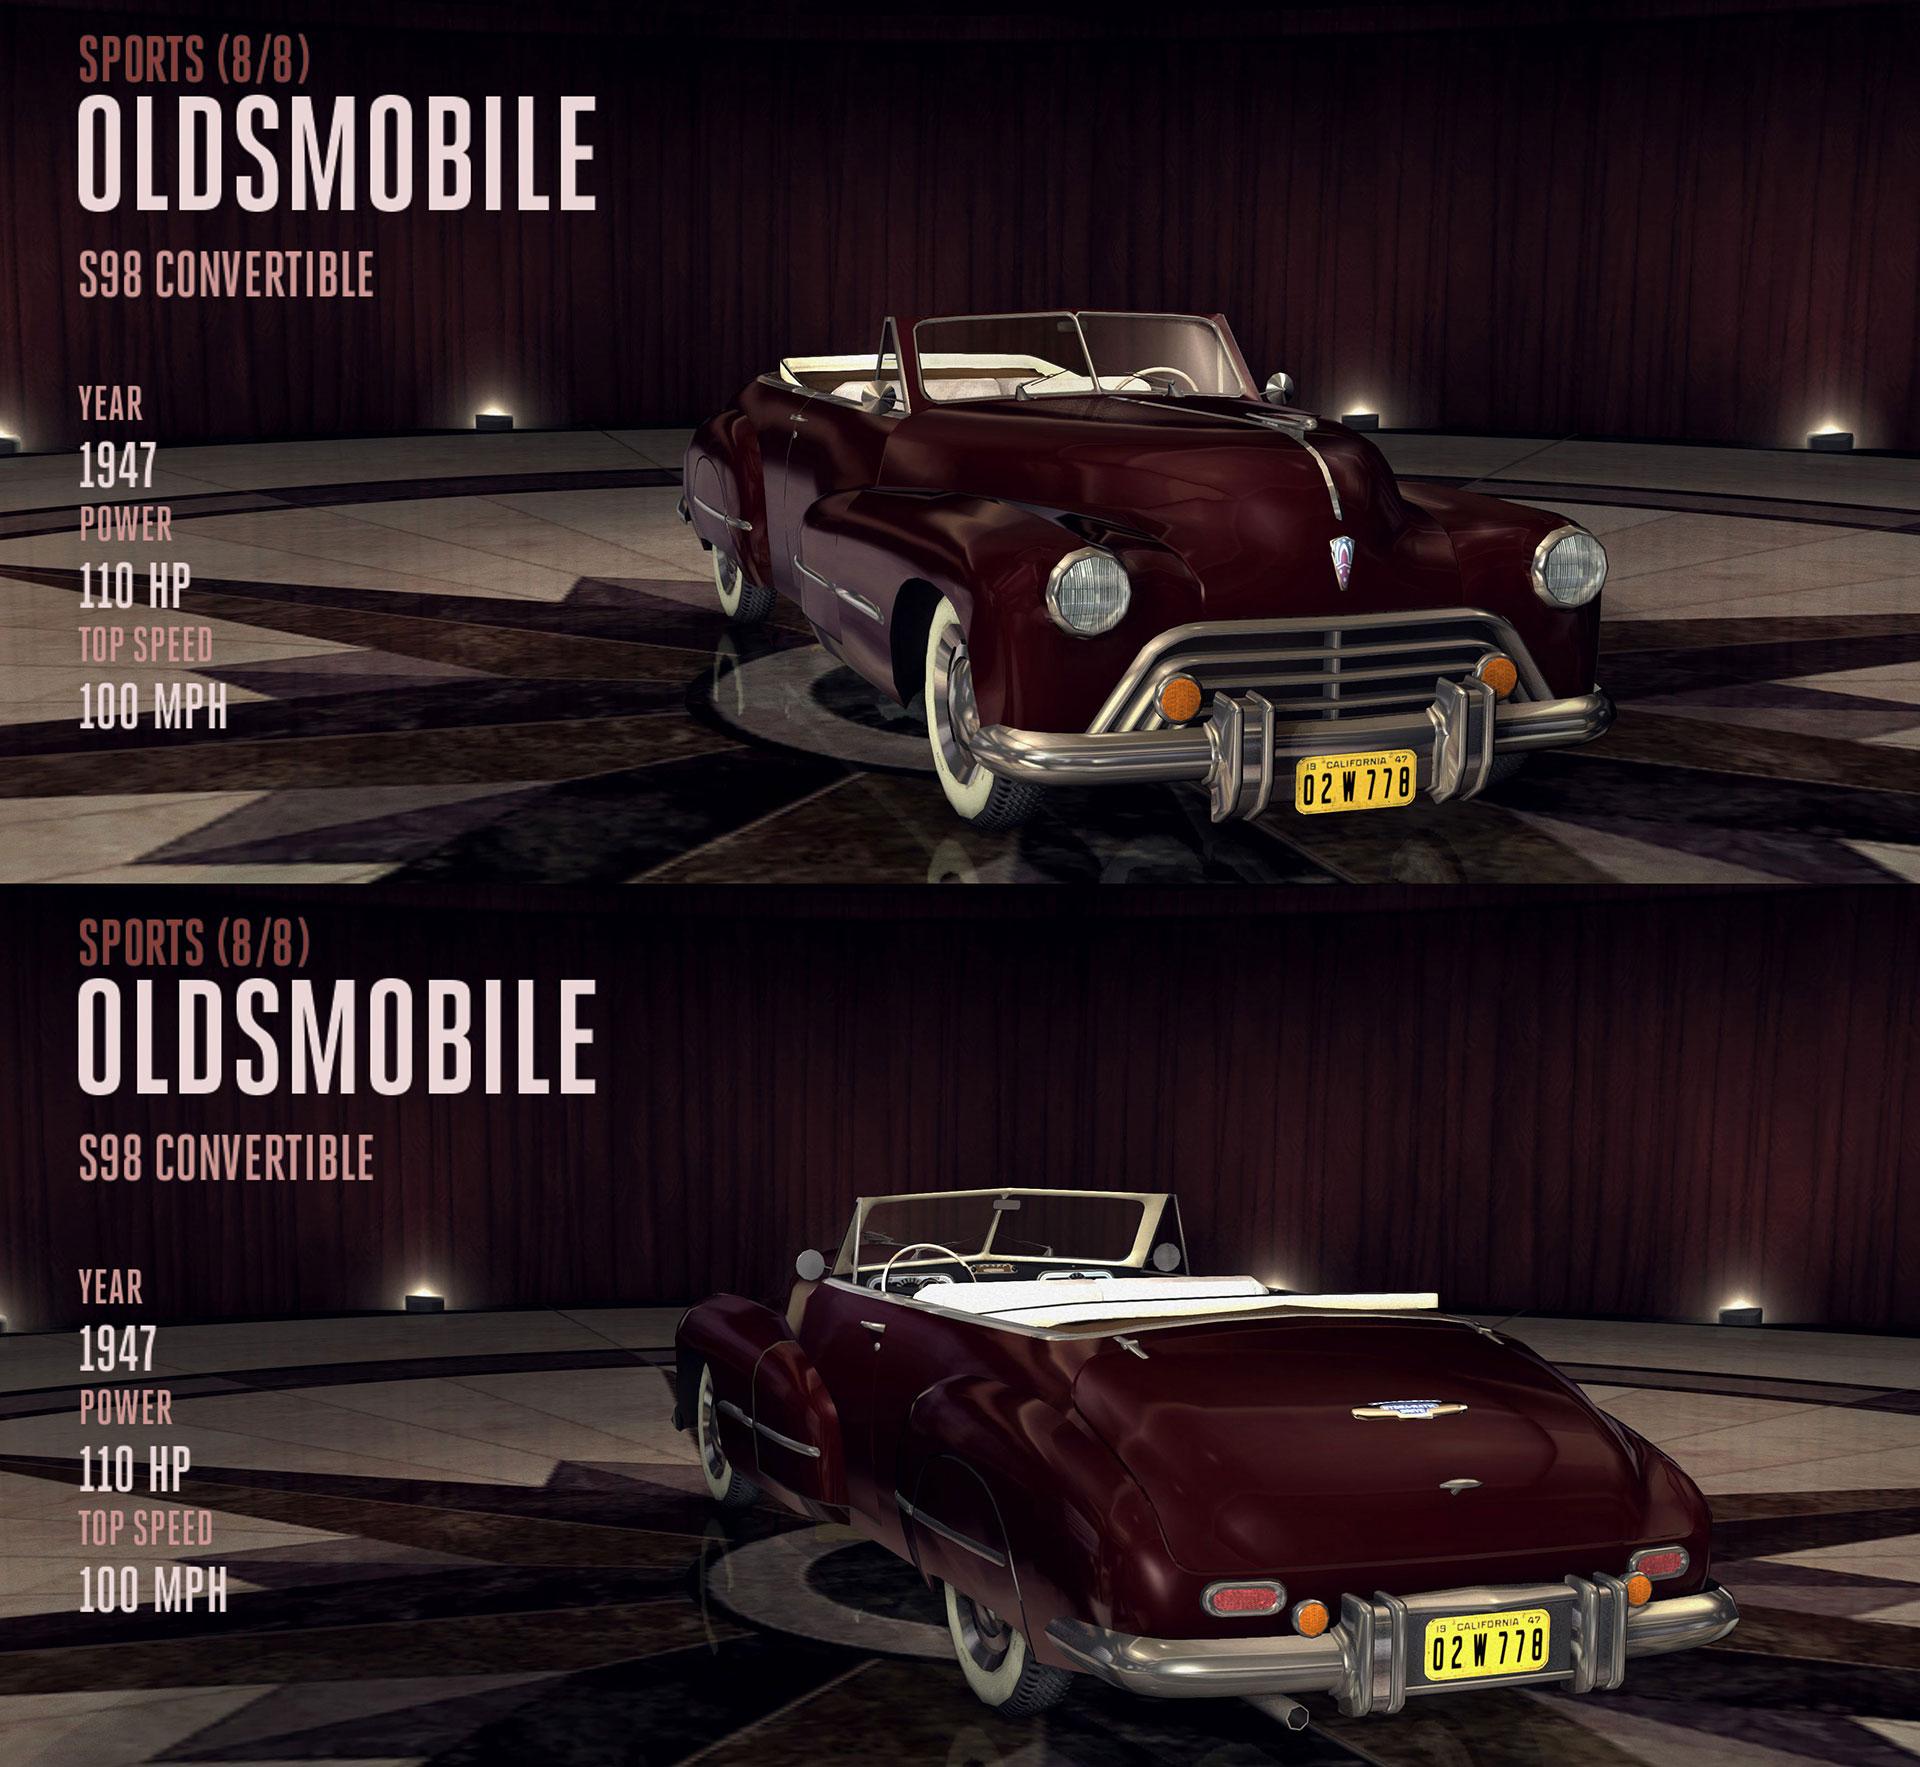 Oldsmobile S98 Convertible